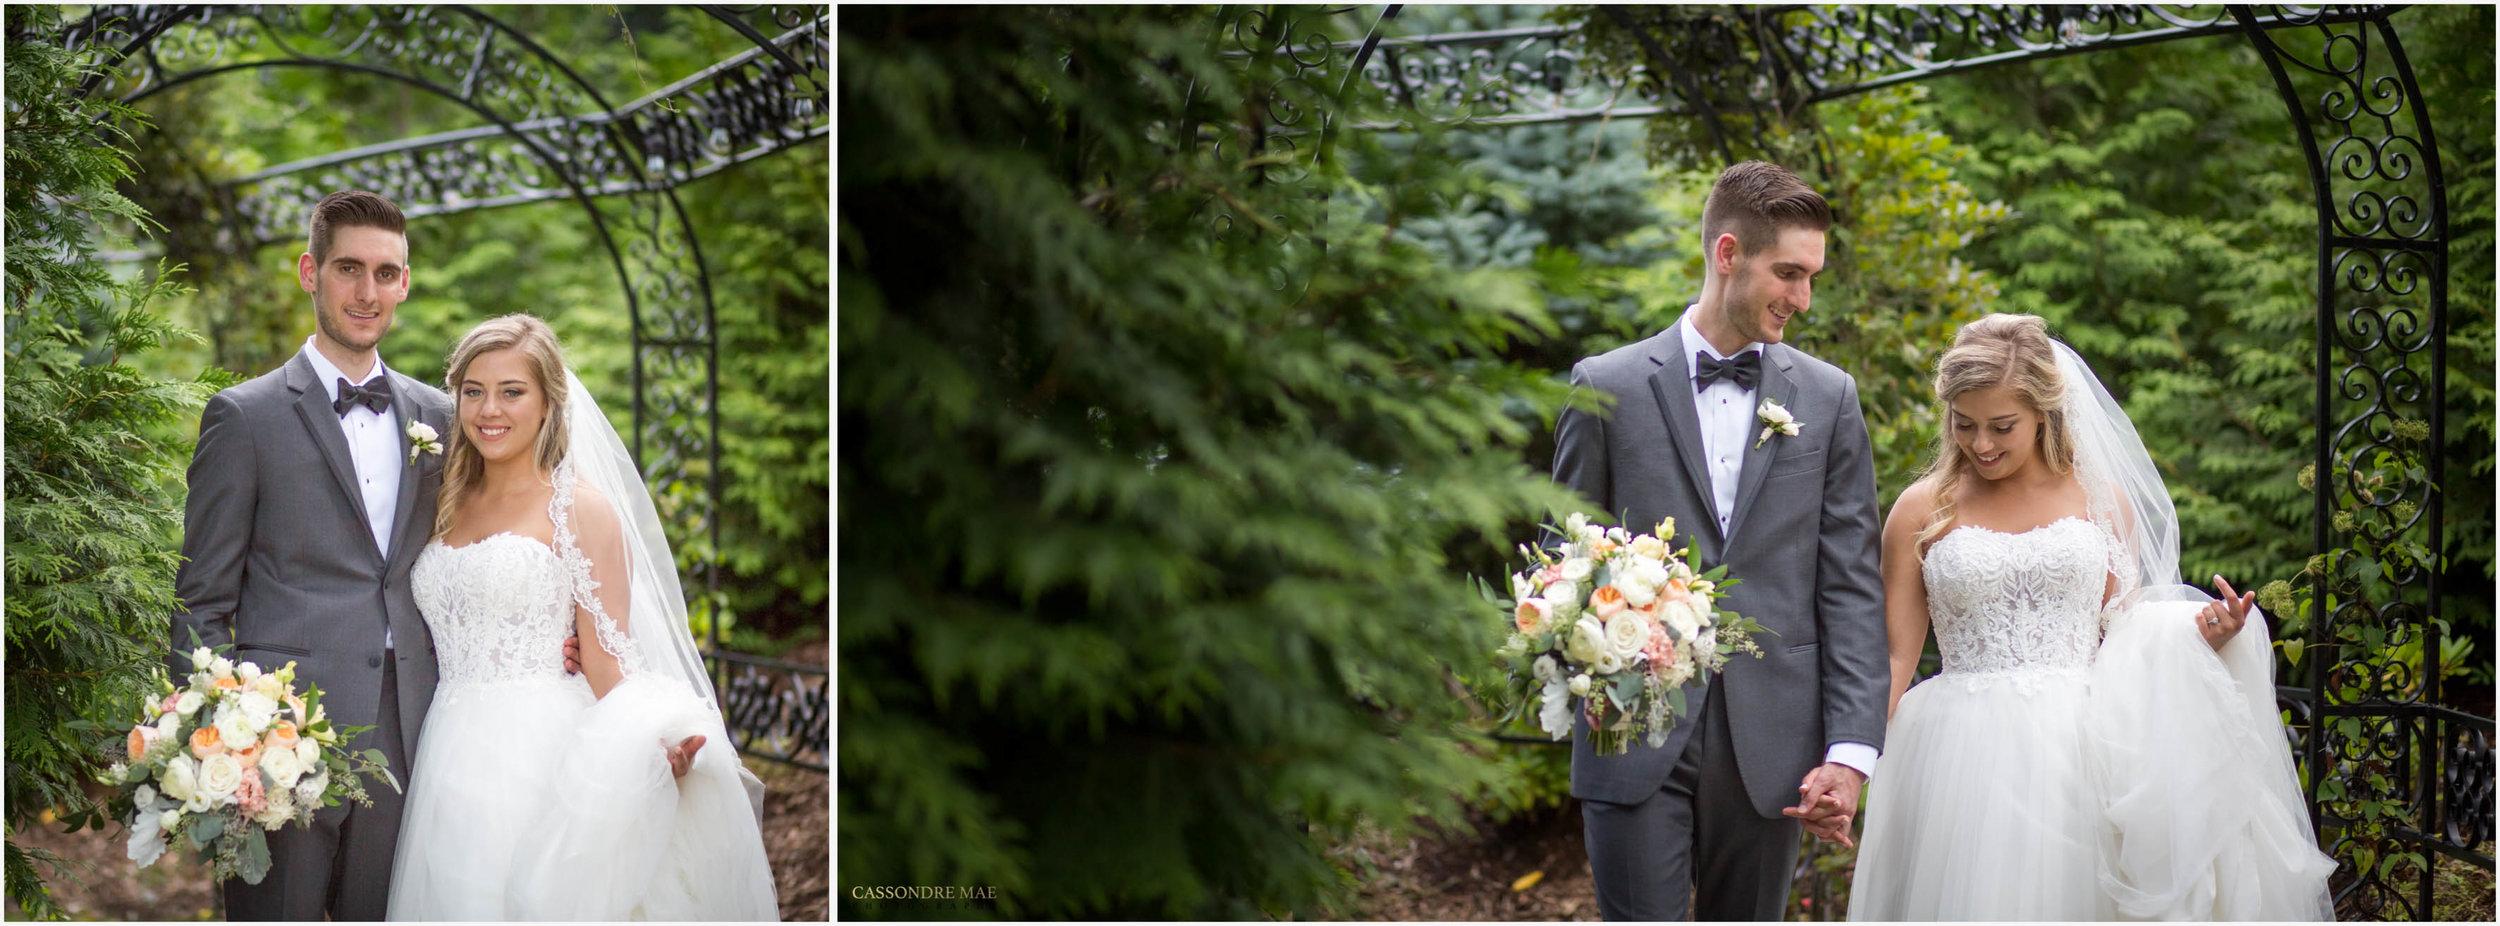 Cassondre Mae Photography Hudson Valley NY Wedding Photographer -18.jpg